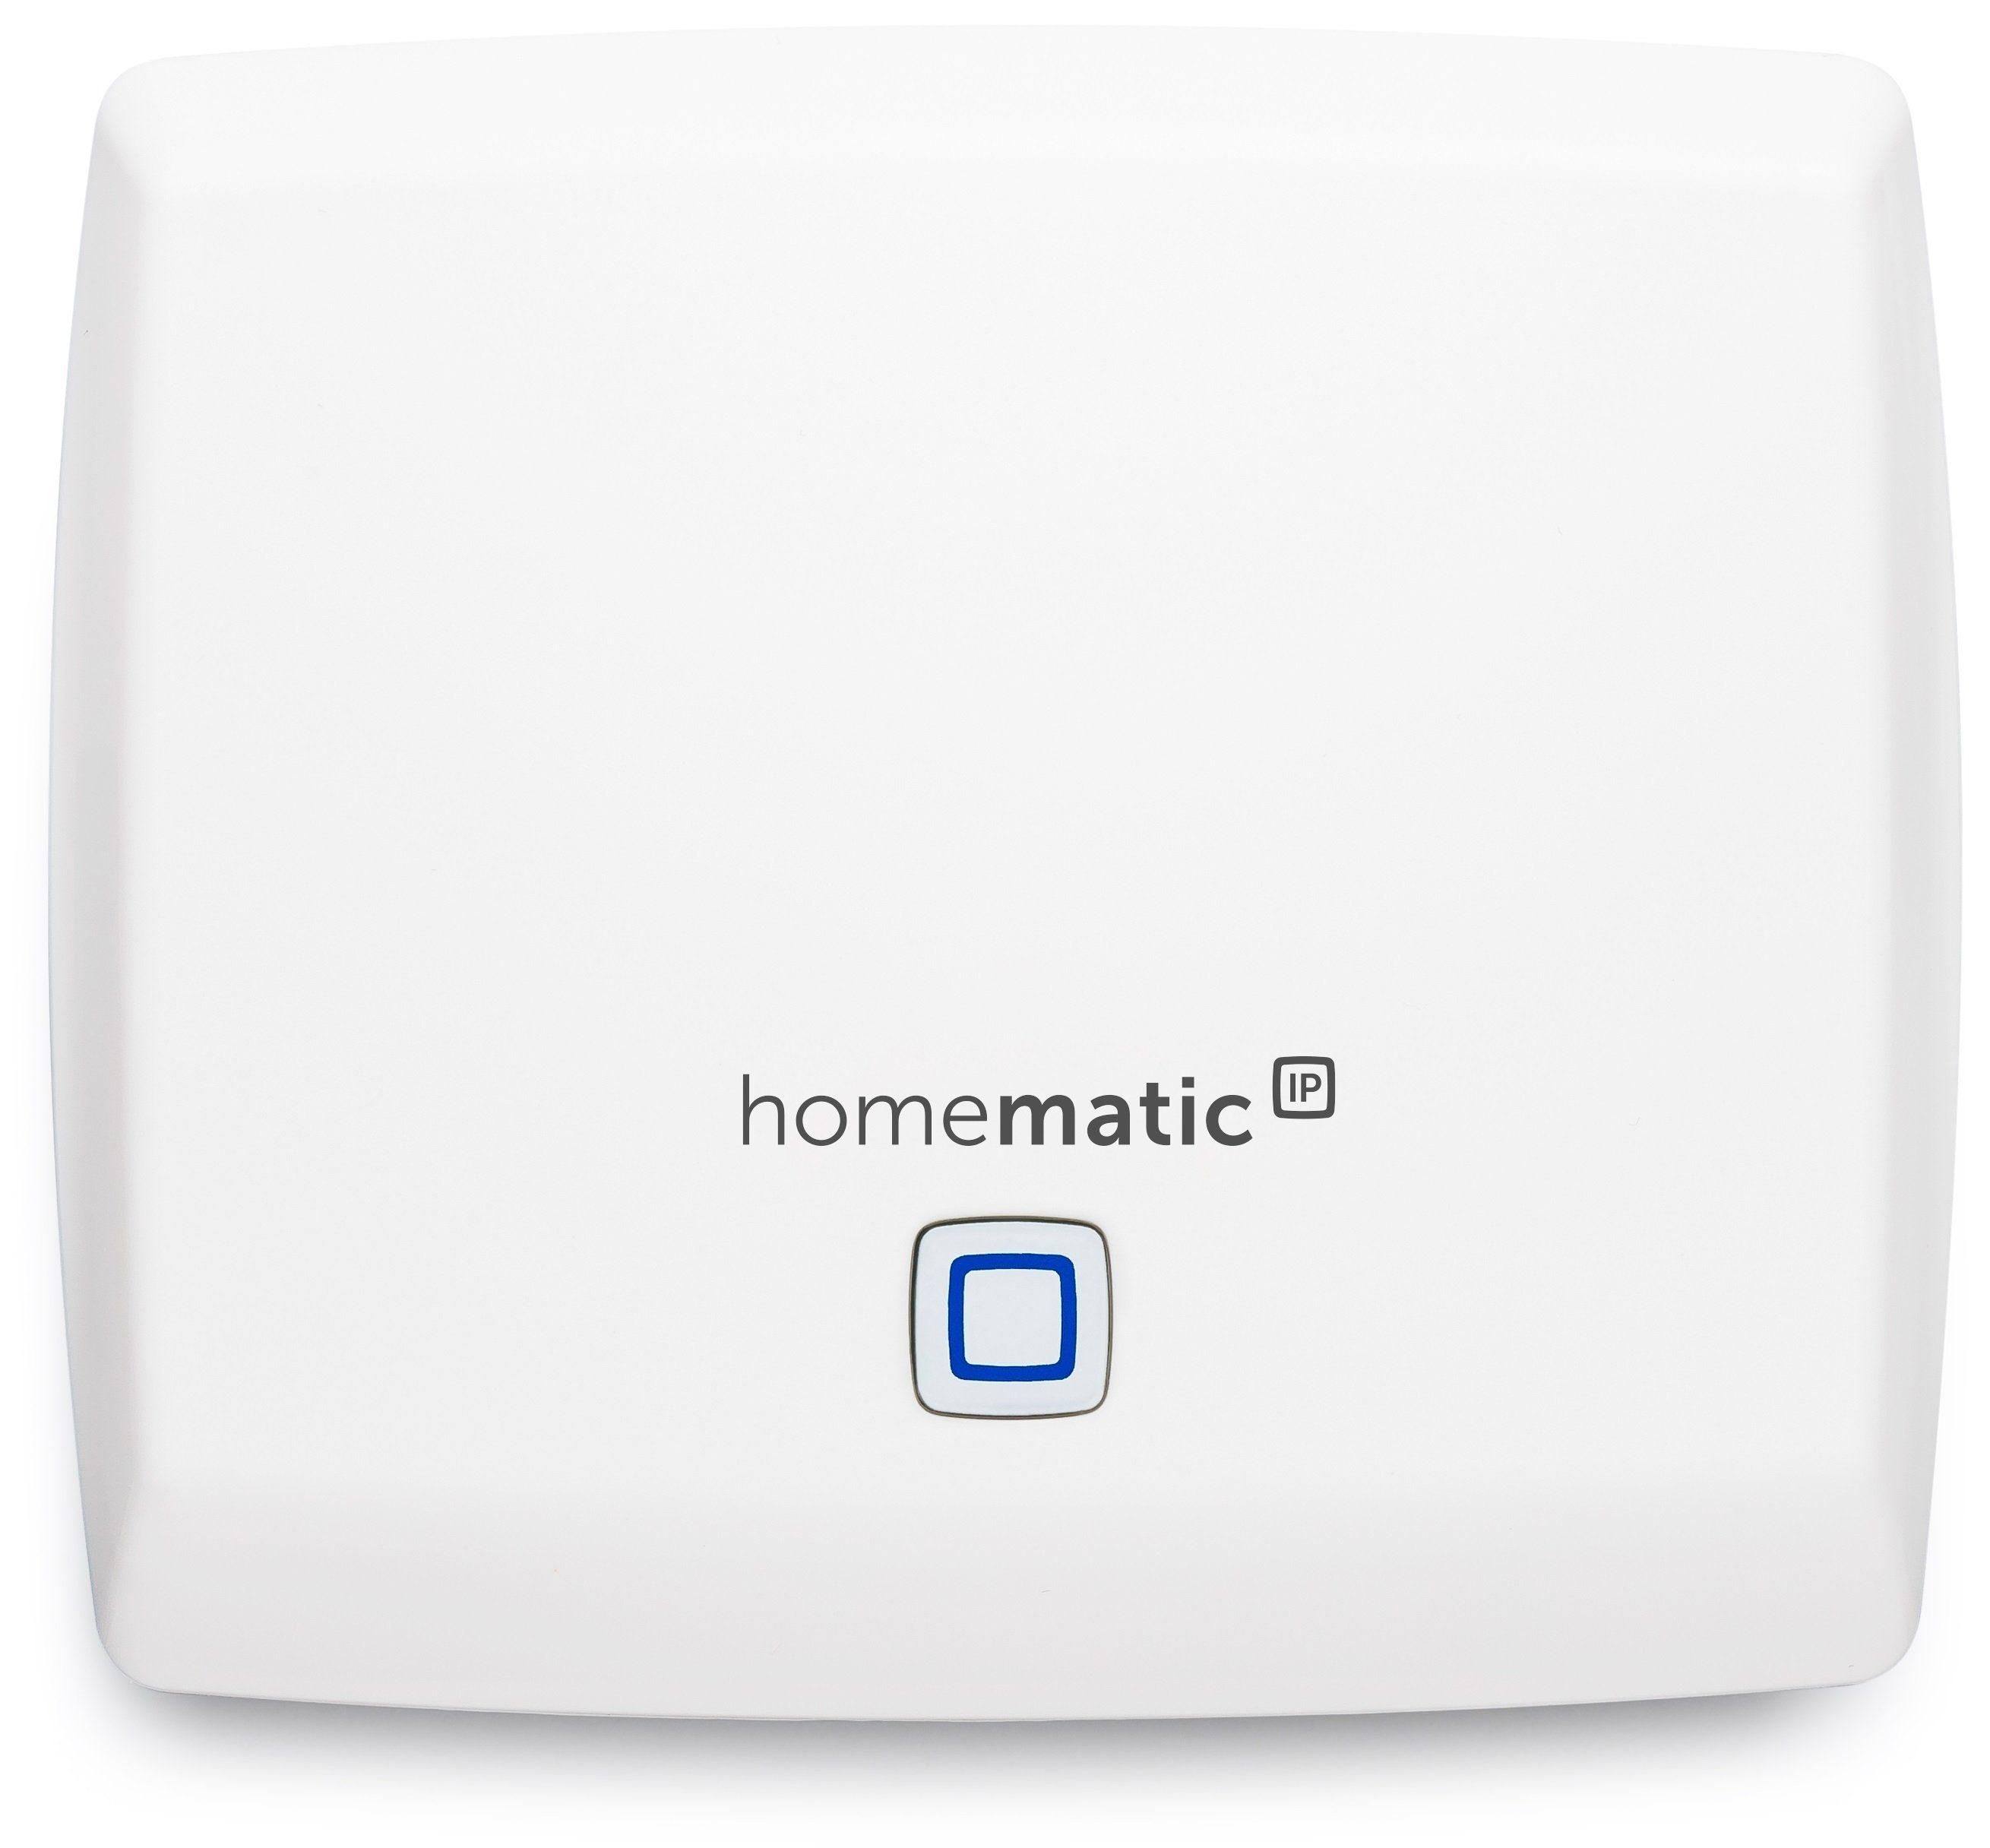 Homematic IP - Smart Home - Steuerung & Komfort »Home Control Access Point«